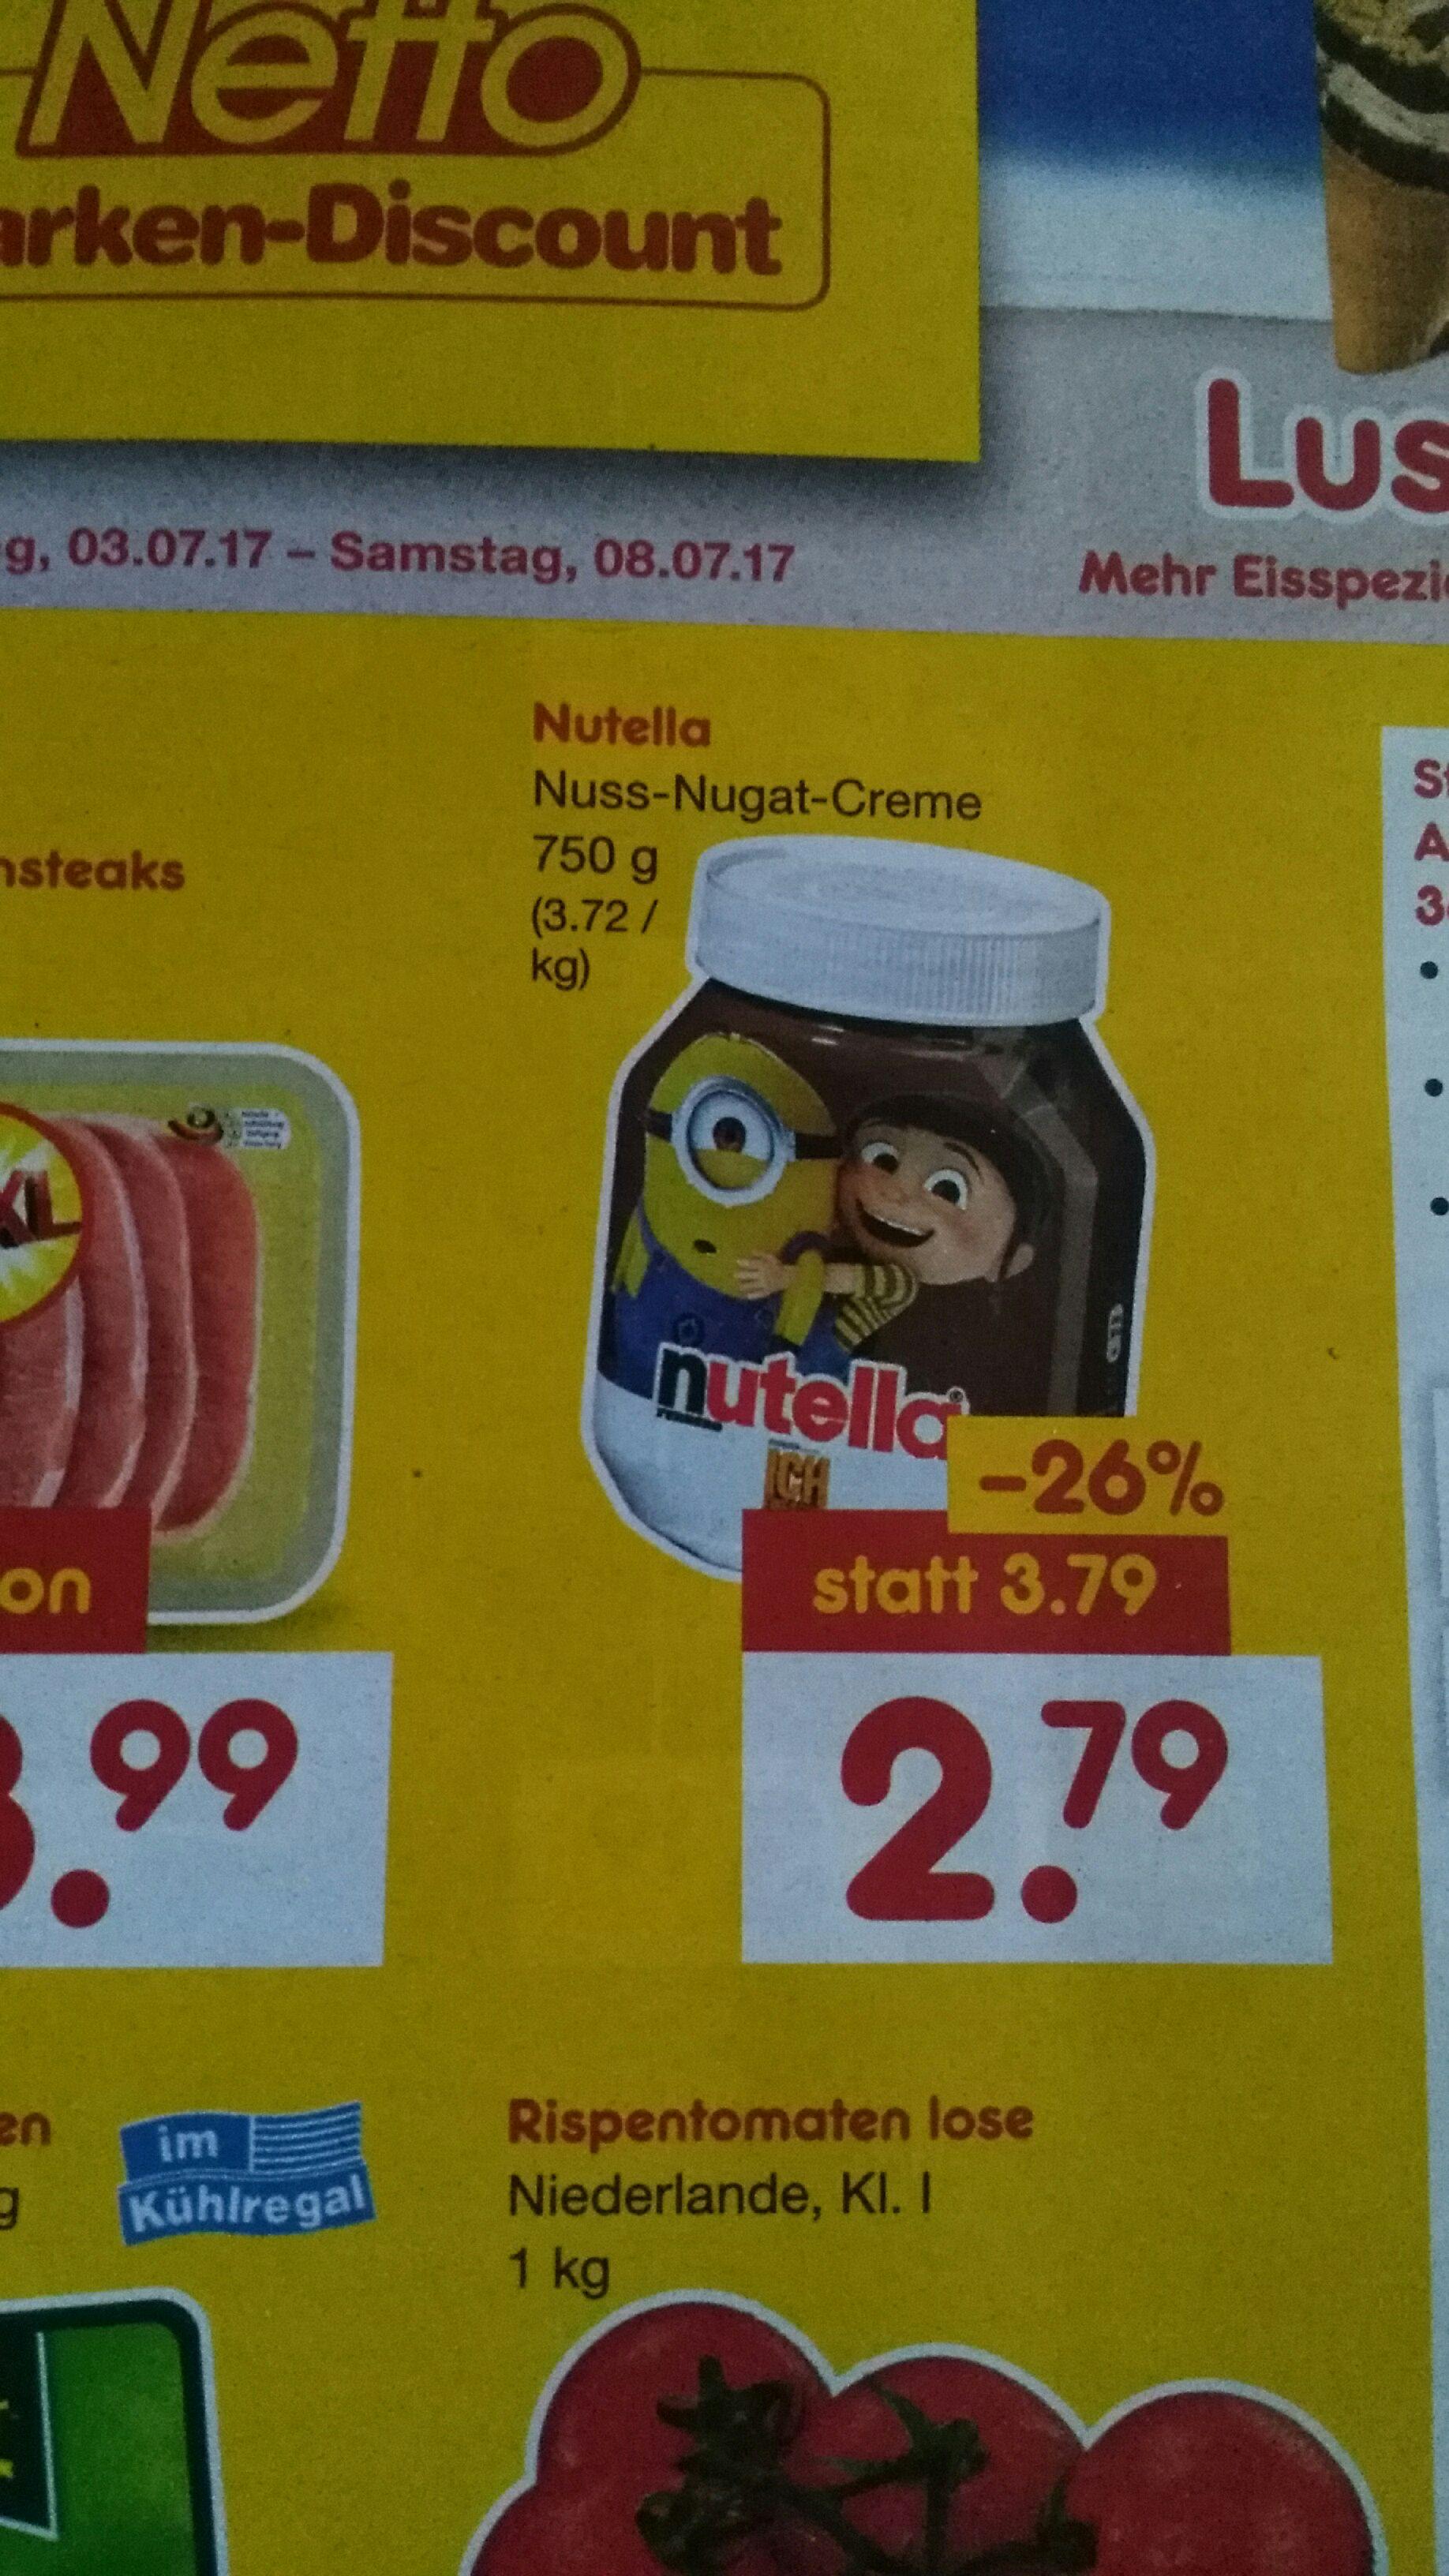 Nutella 750g bei Netto. Statt 3,79€